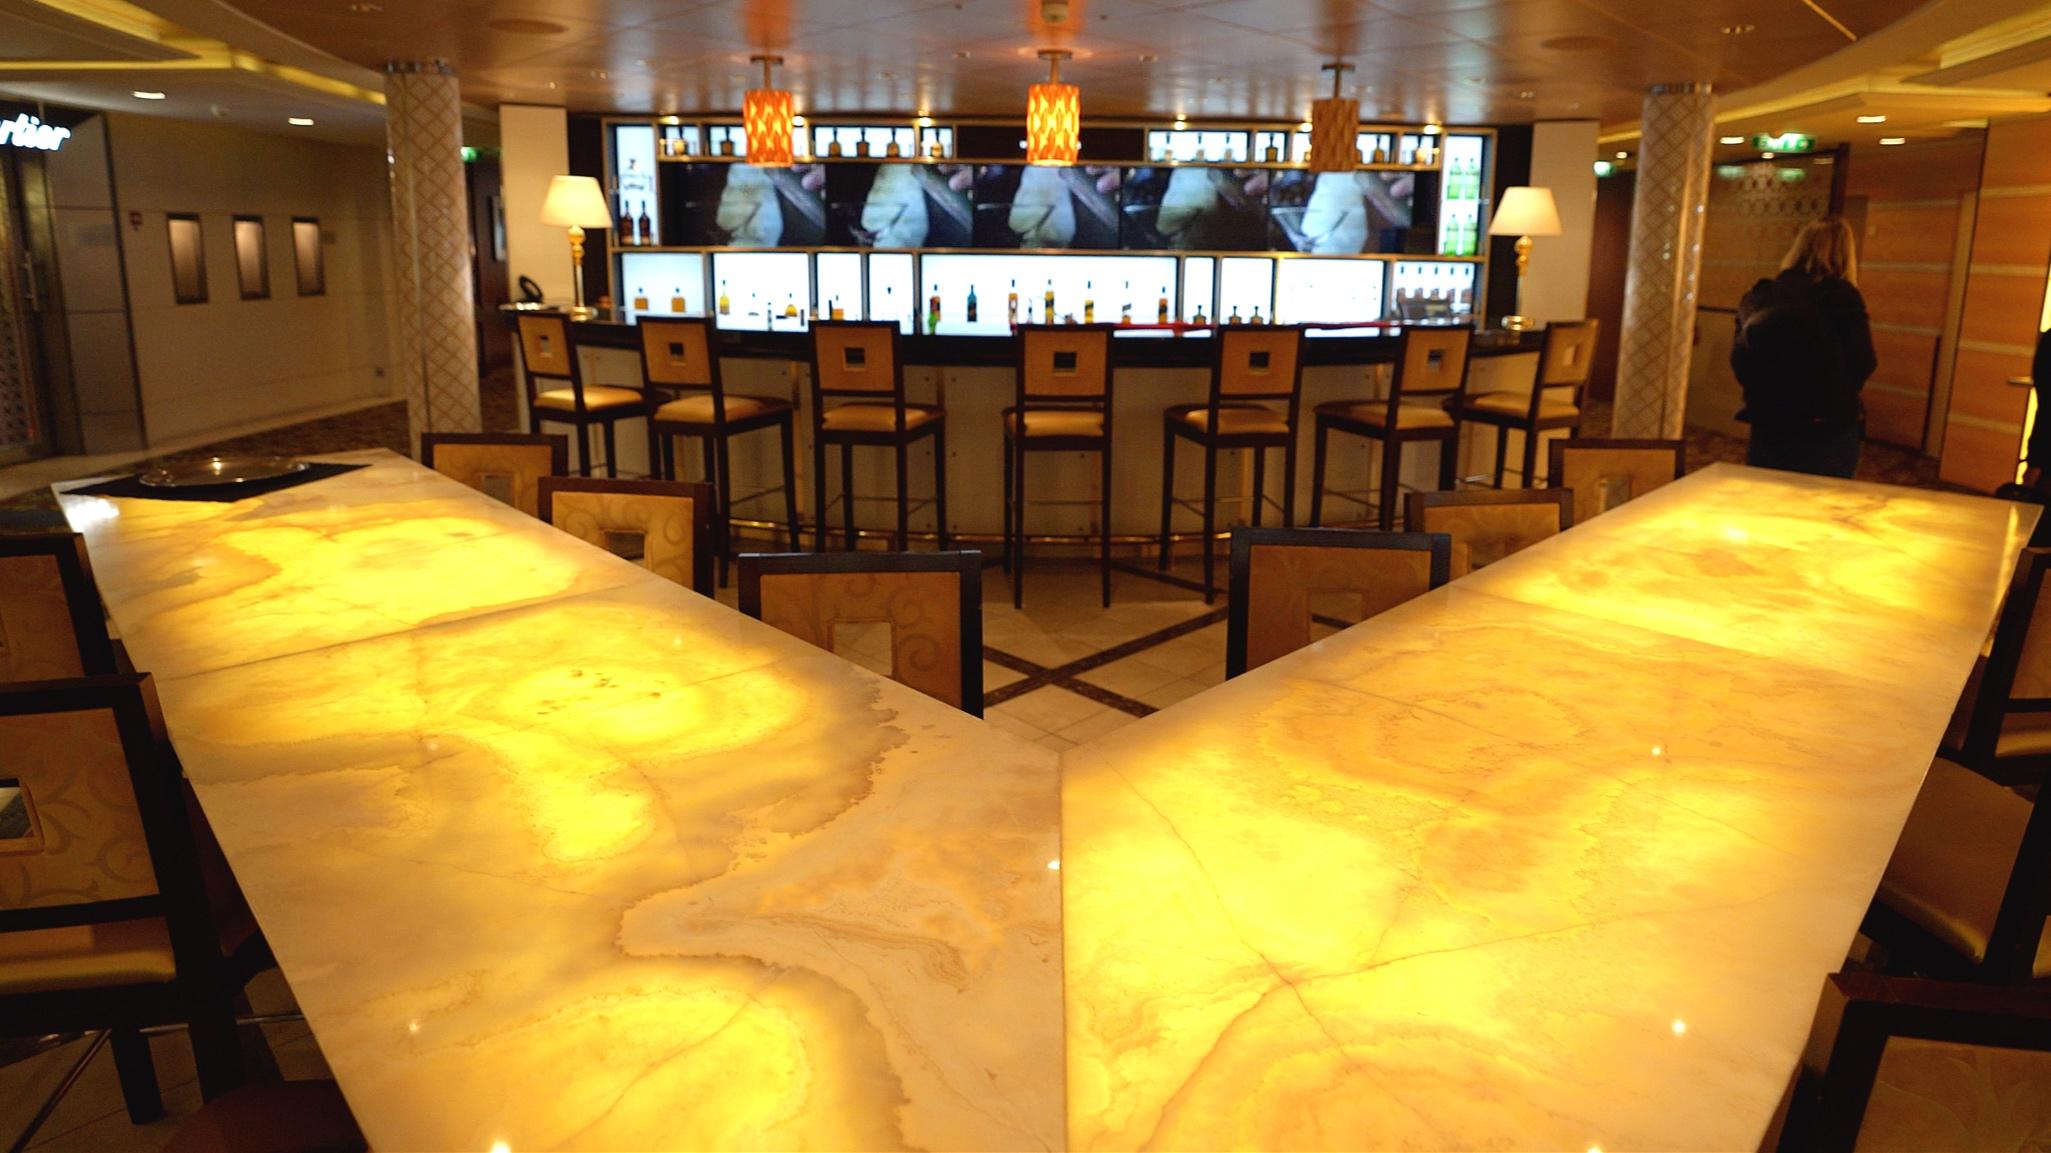 The World class bar